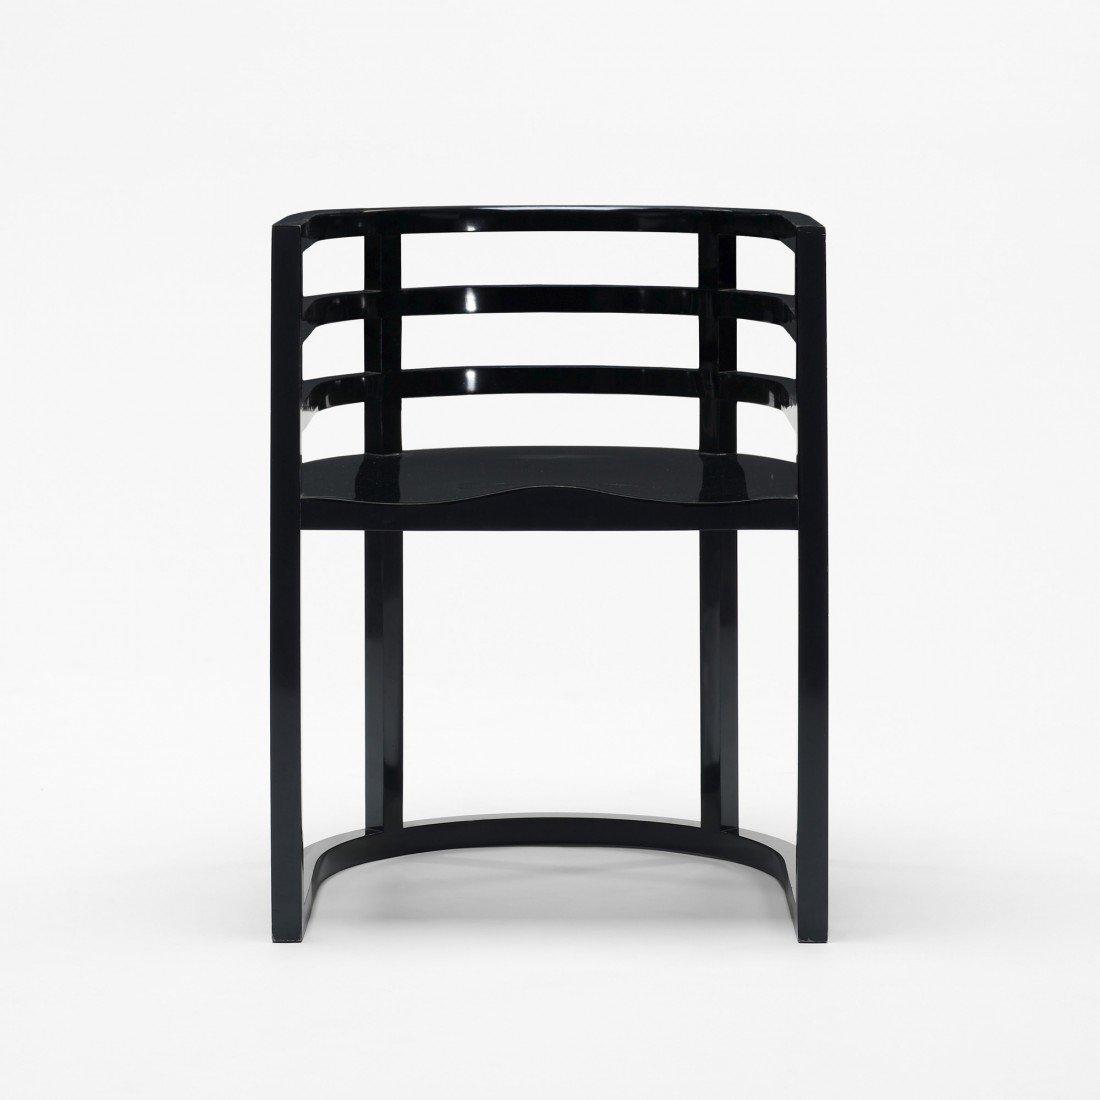 168: Richard Meier armchair, model 810A